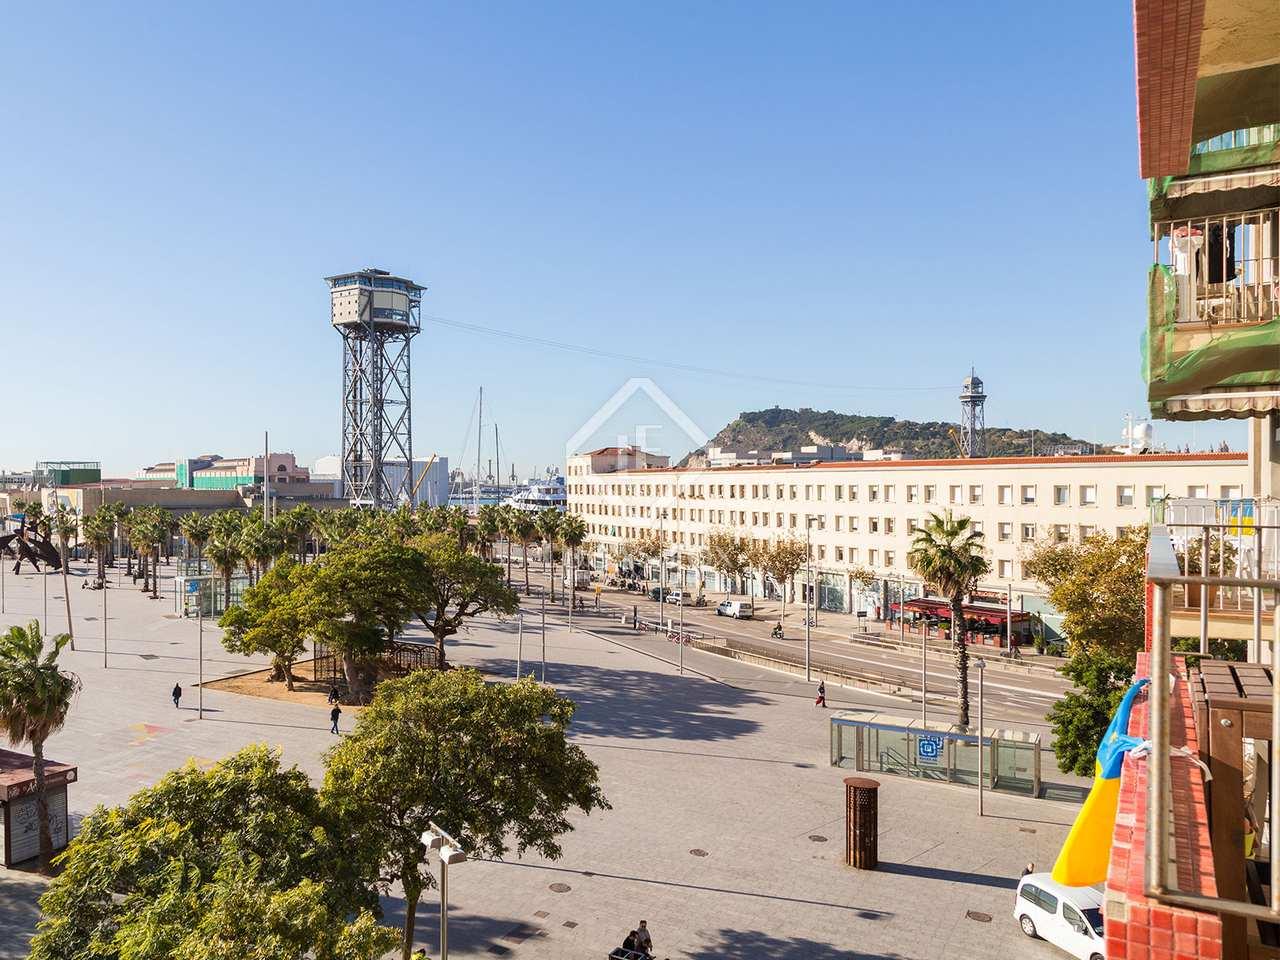 Appartement en vente face la mer barcelone for Appart hotel barcelone avec piscine